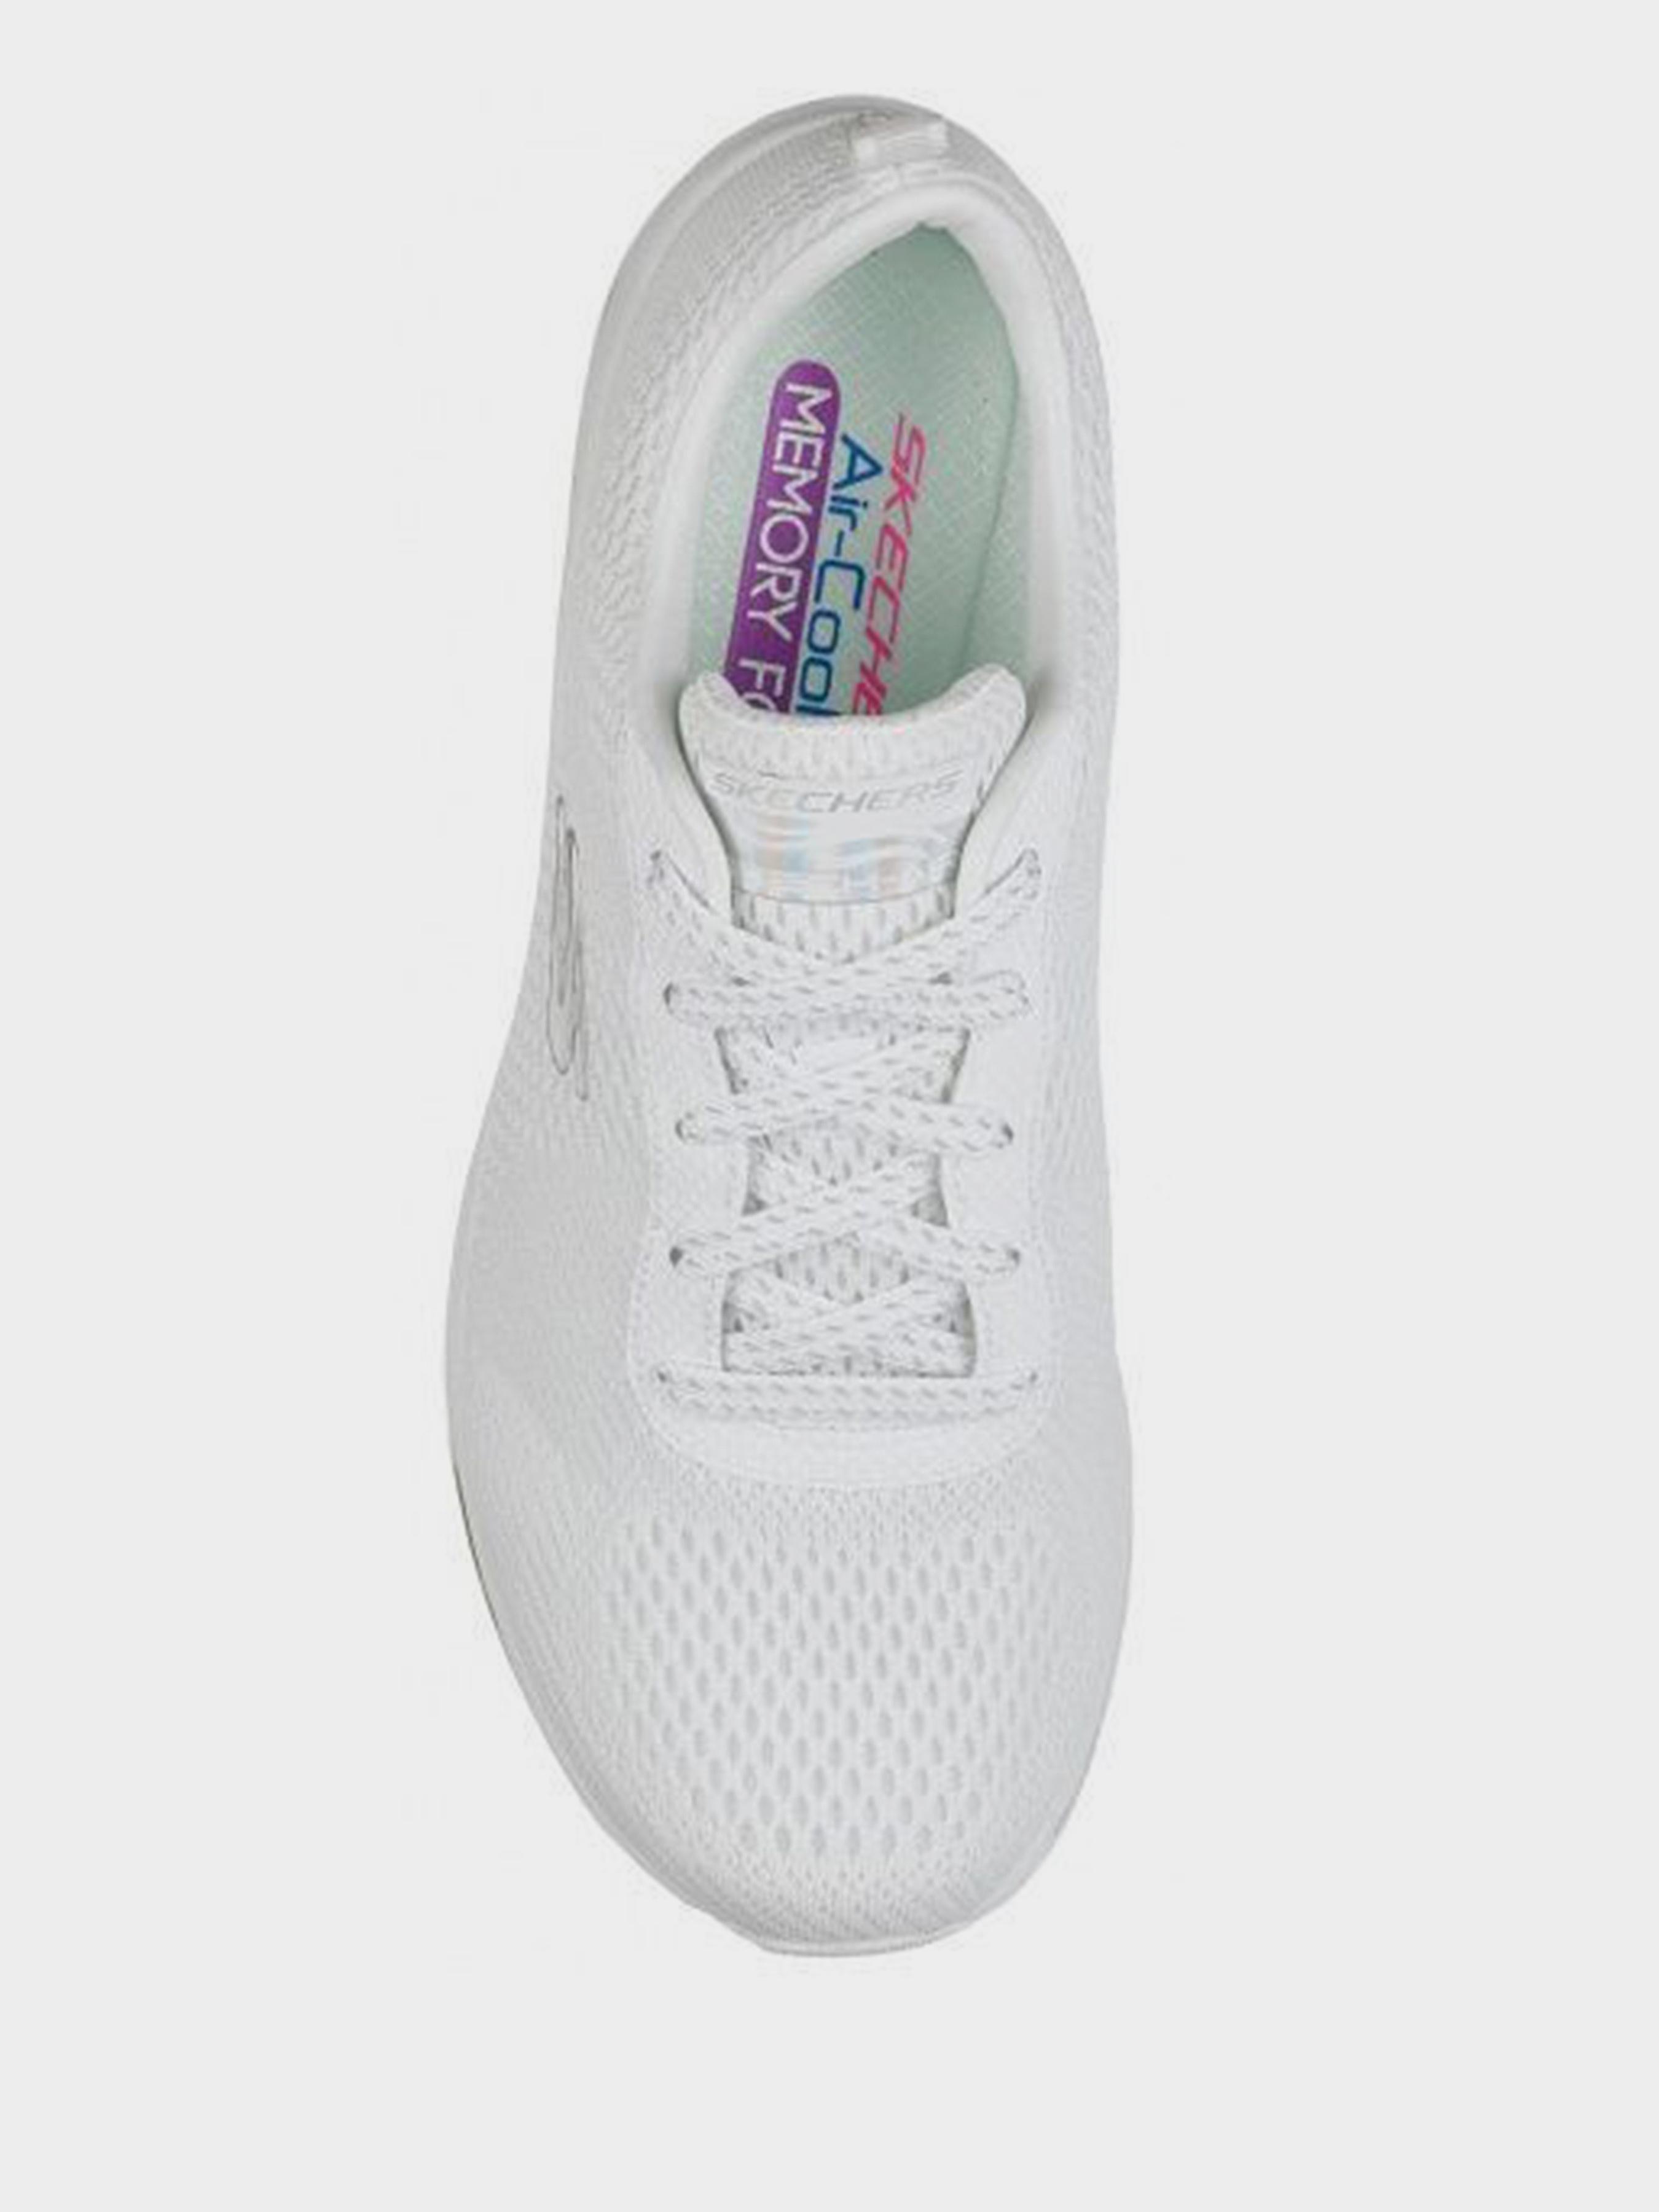 Кроссовки для женщин Skechers KW4967 , 2017